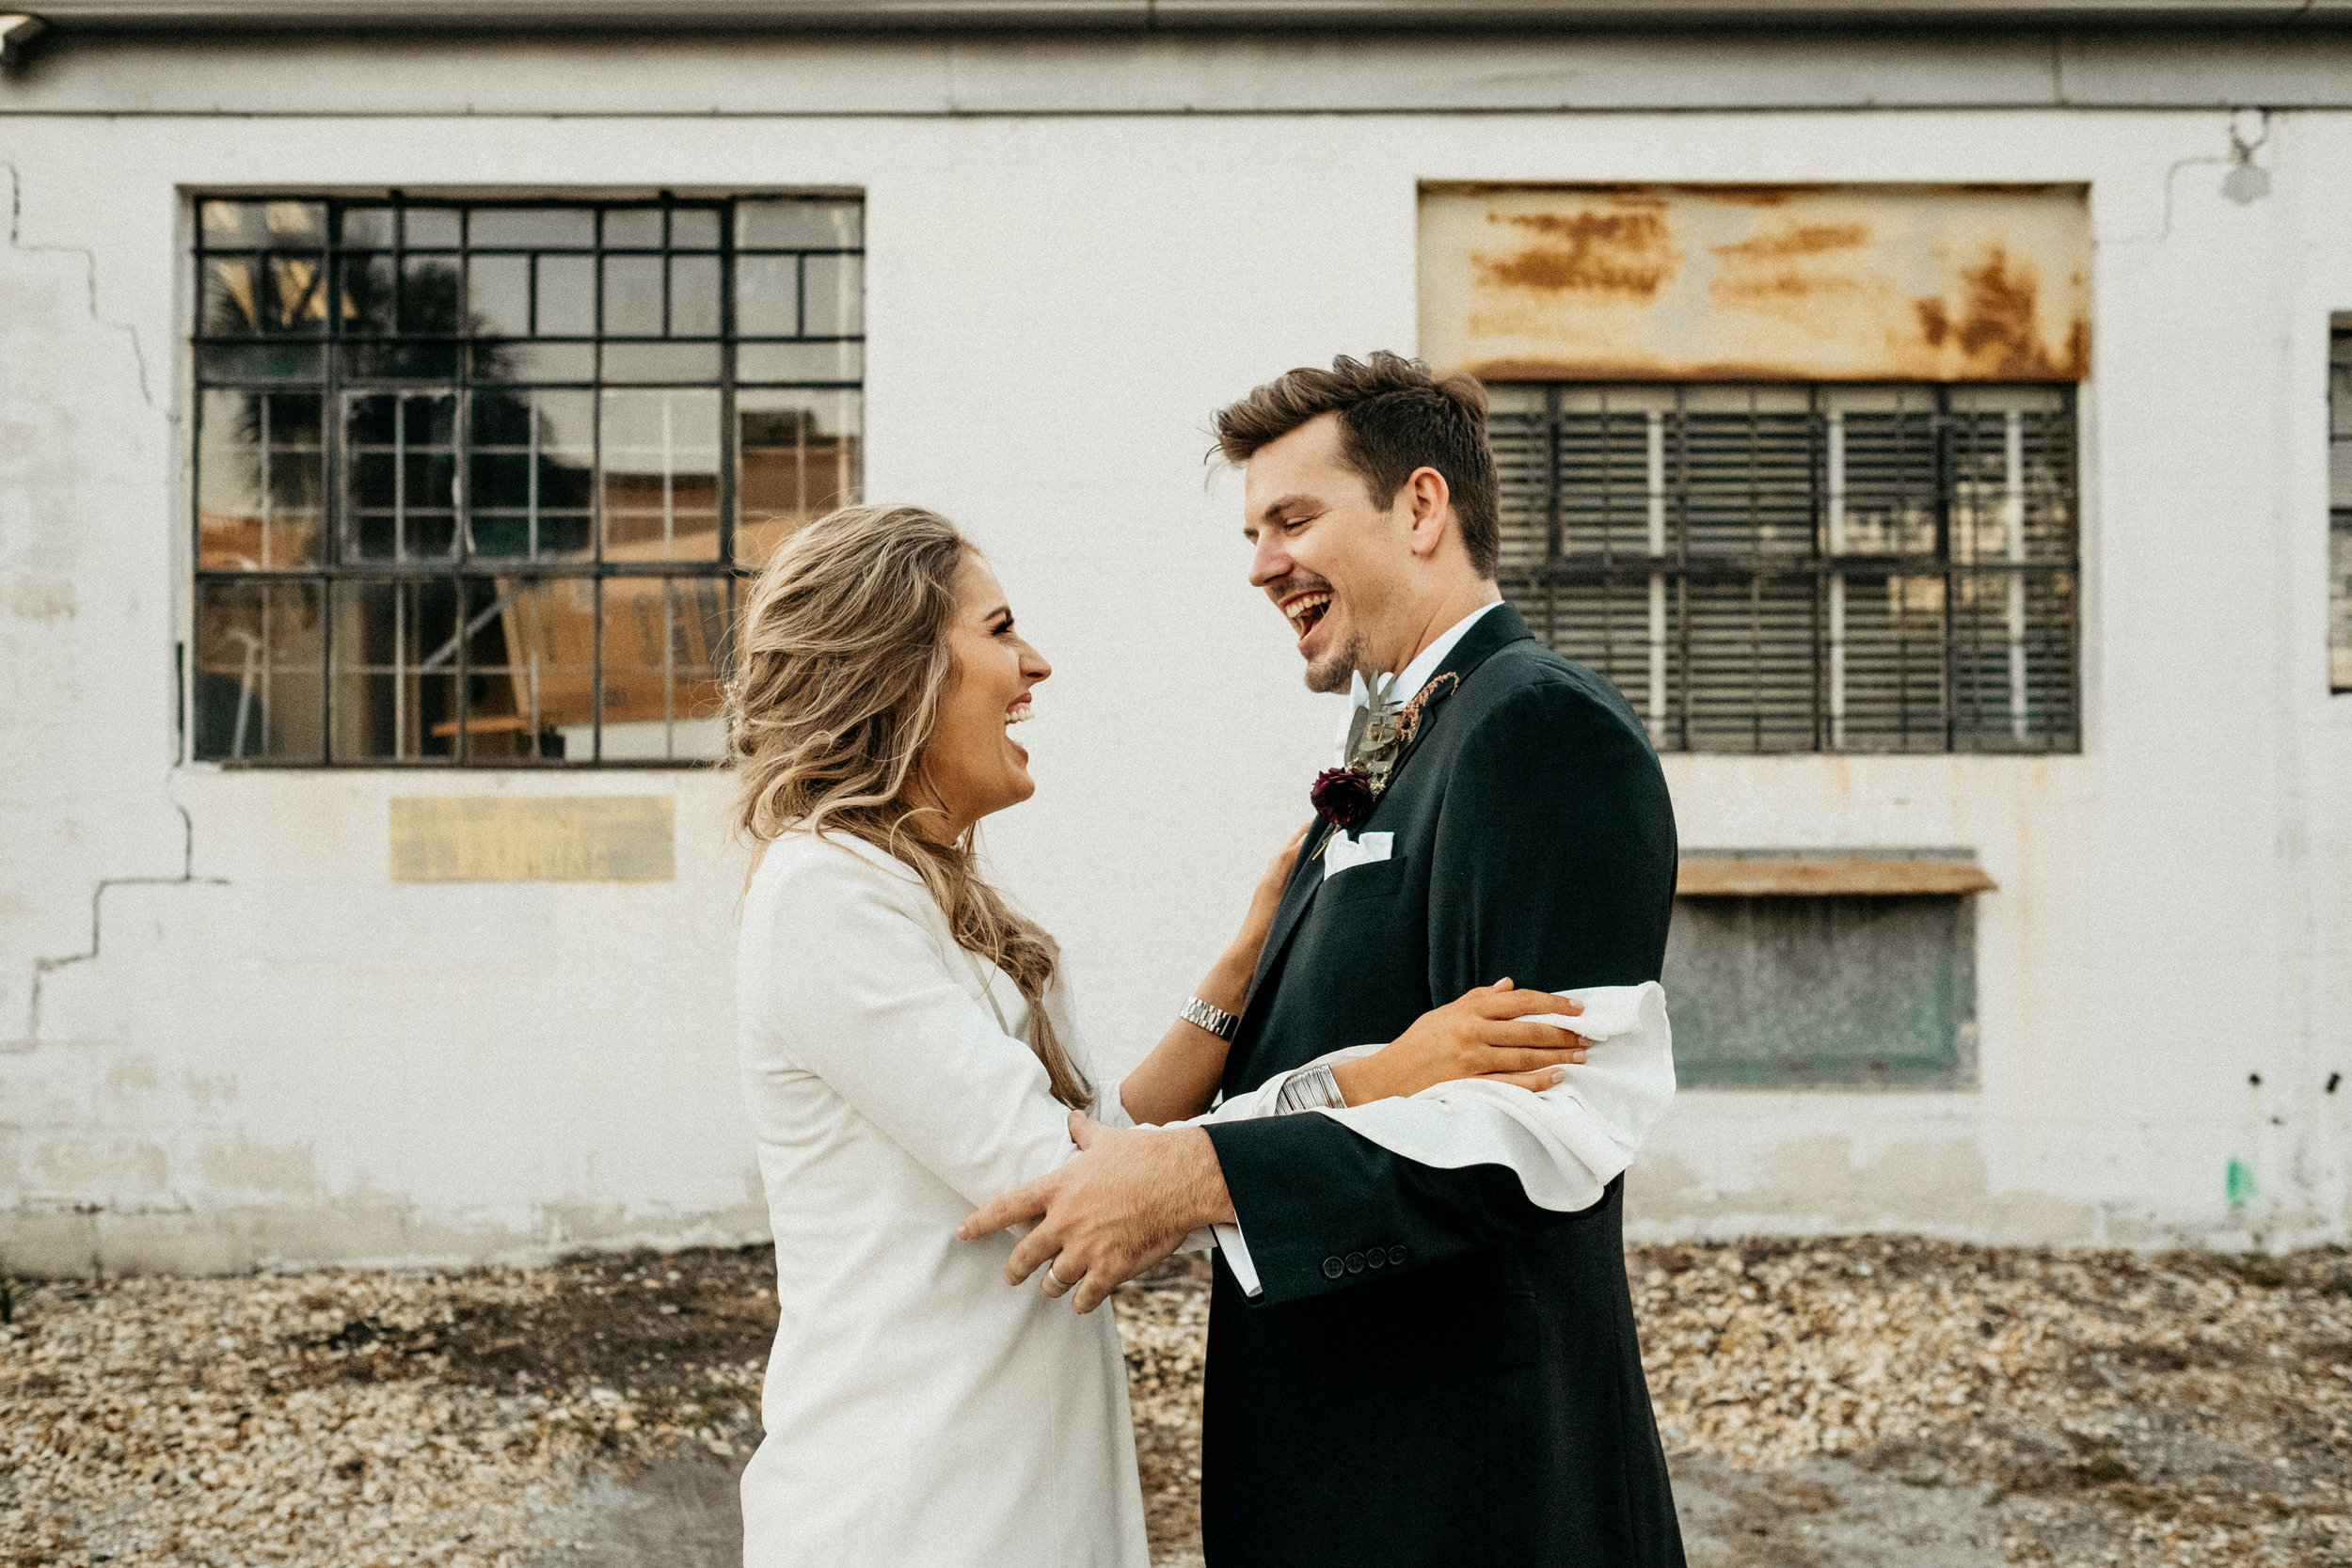 Copy of Alden + Jasah | Tampa | Intimate Wedding